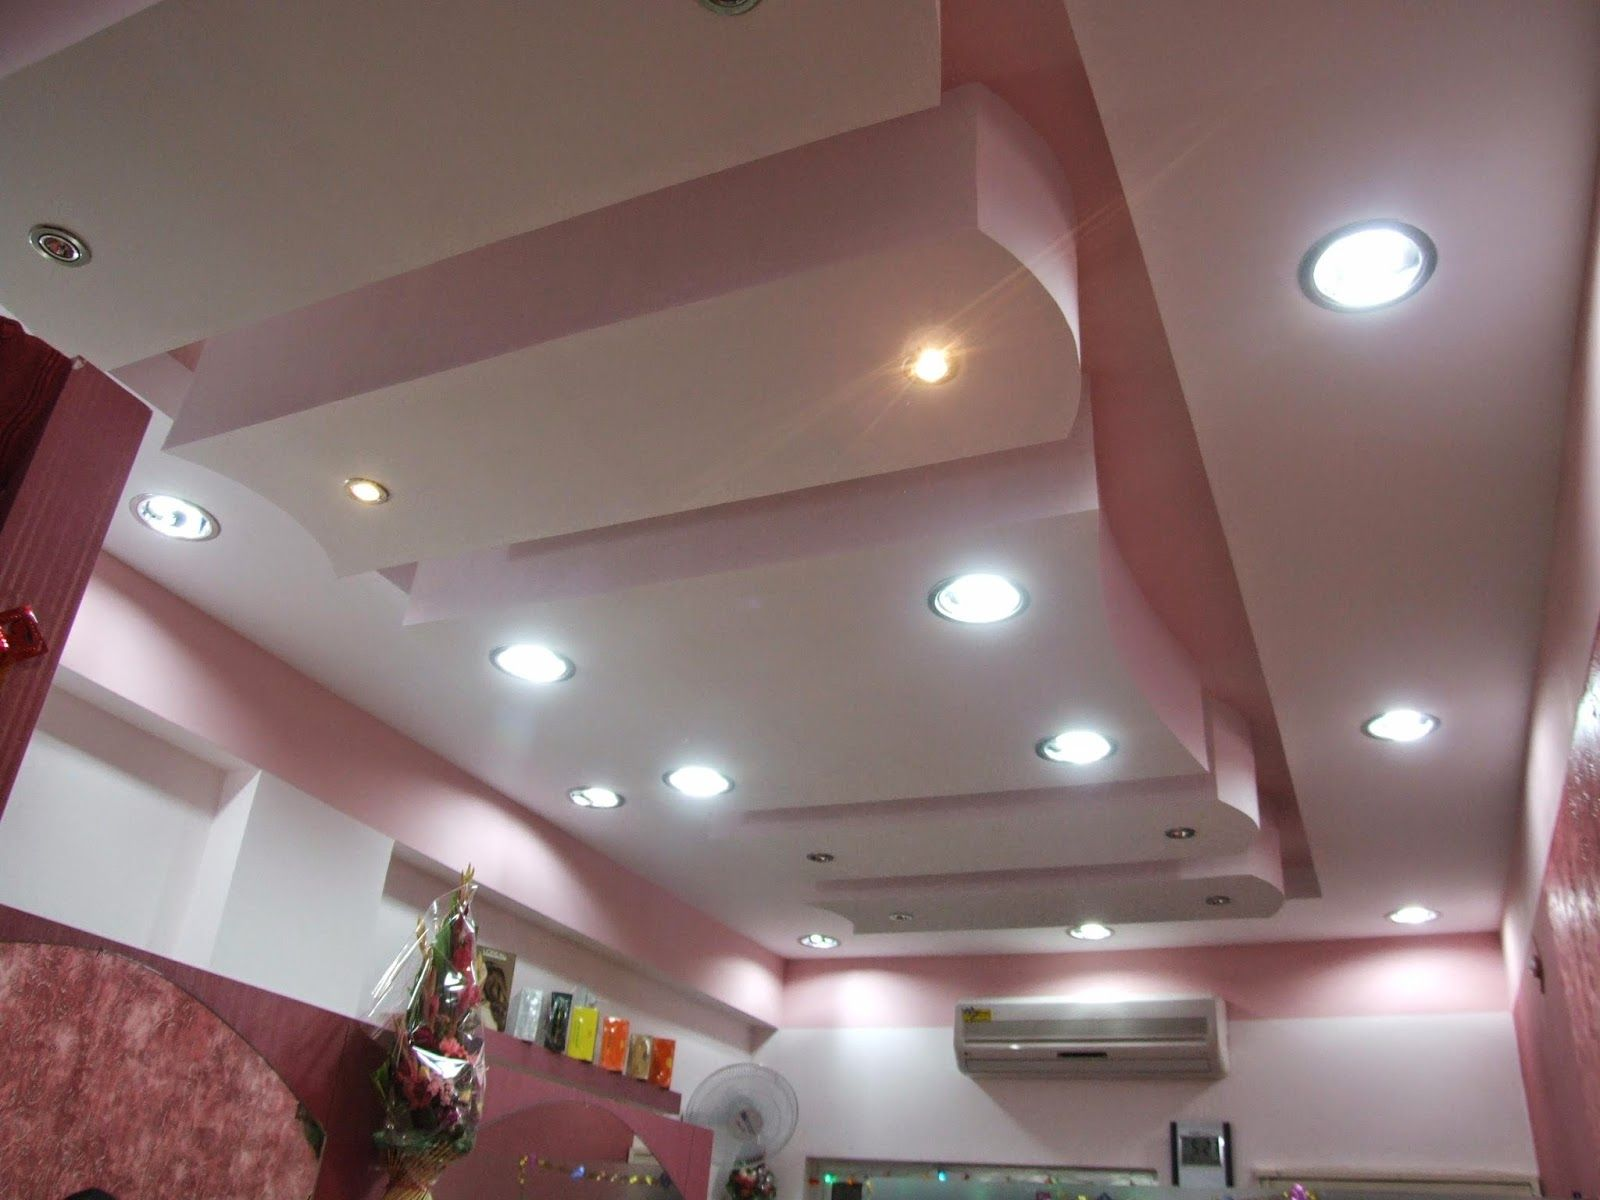 lighting modern false ceiling drop board fresh for gypsum designs made of ideas living